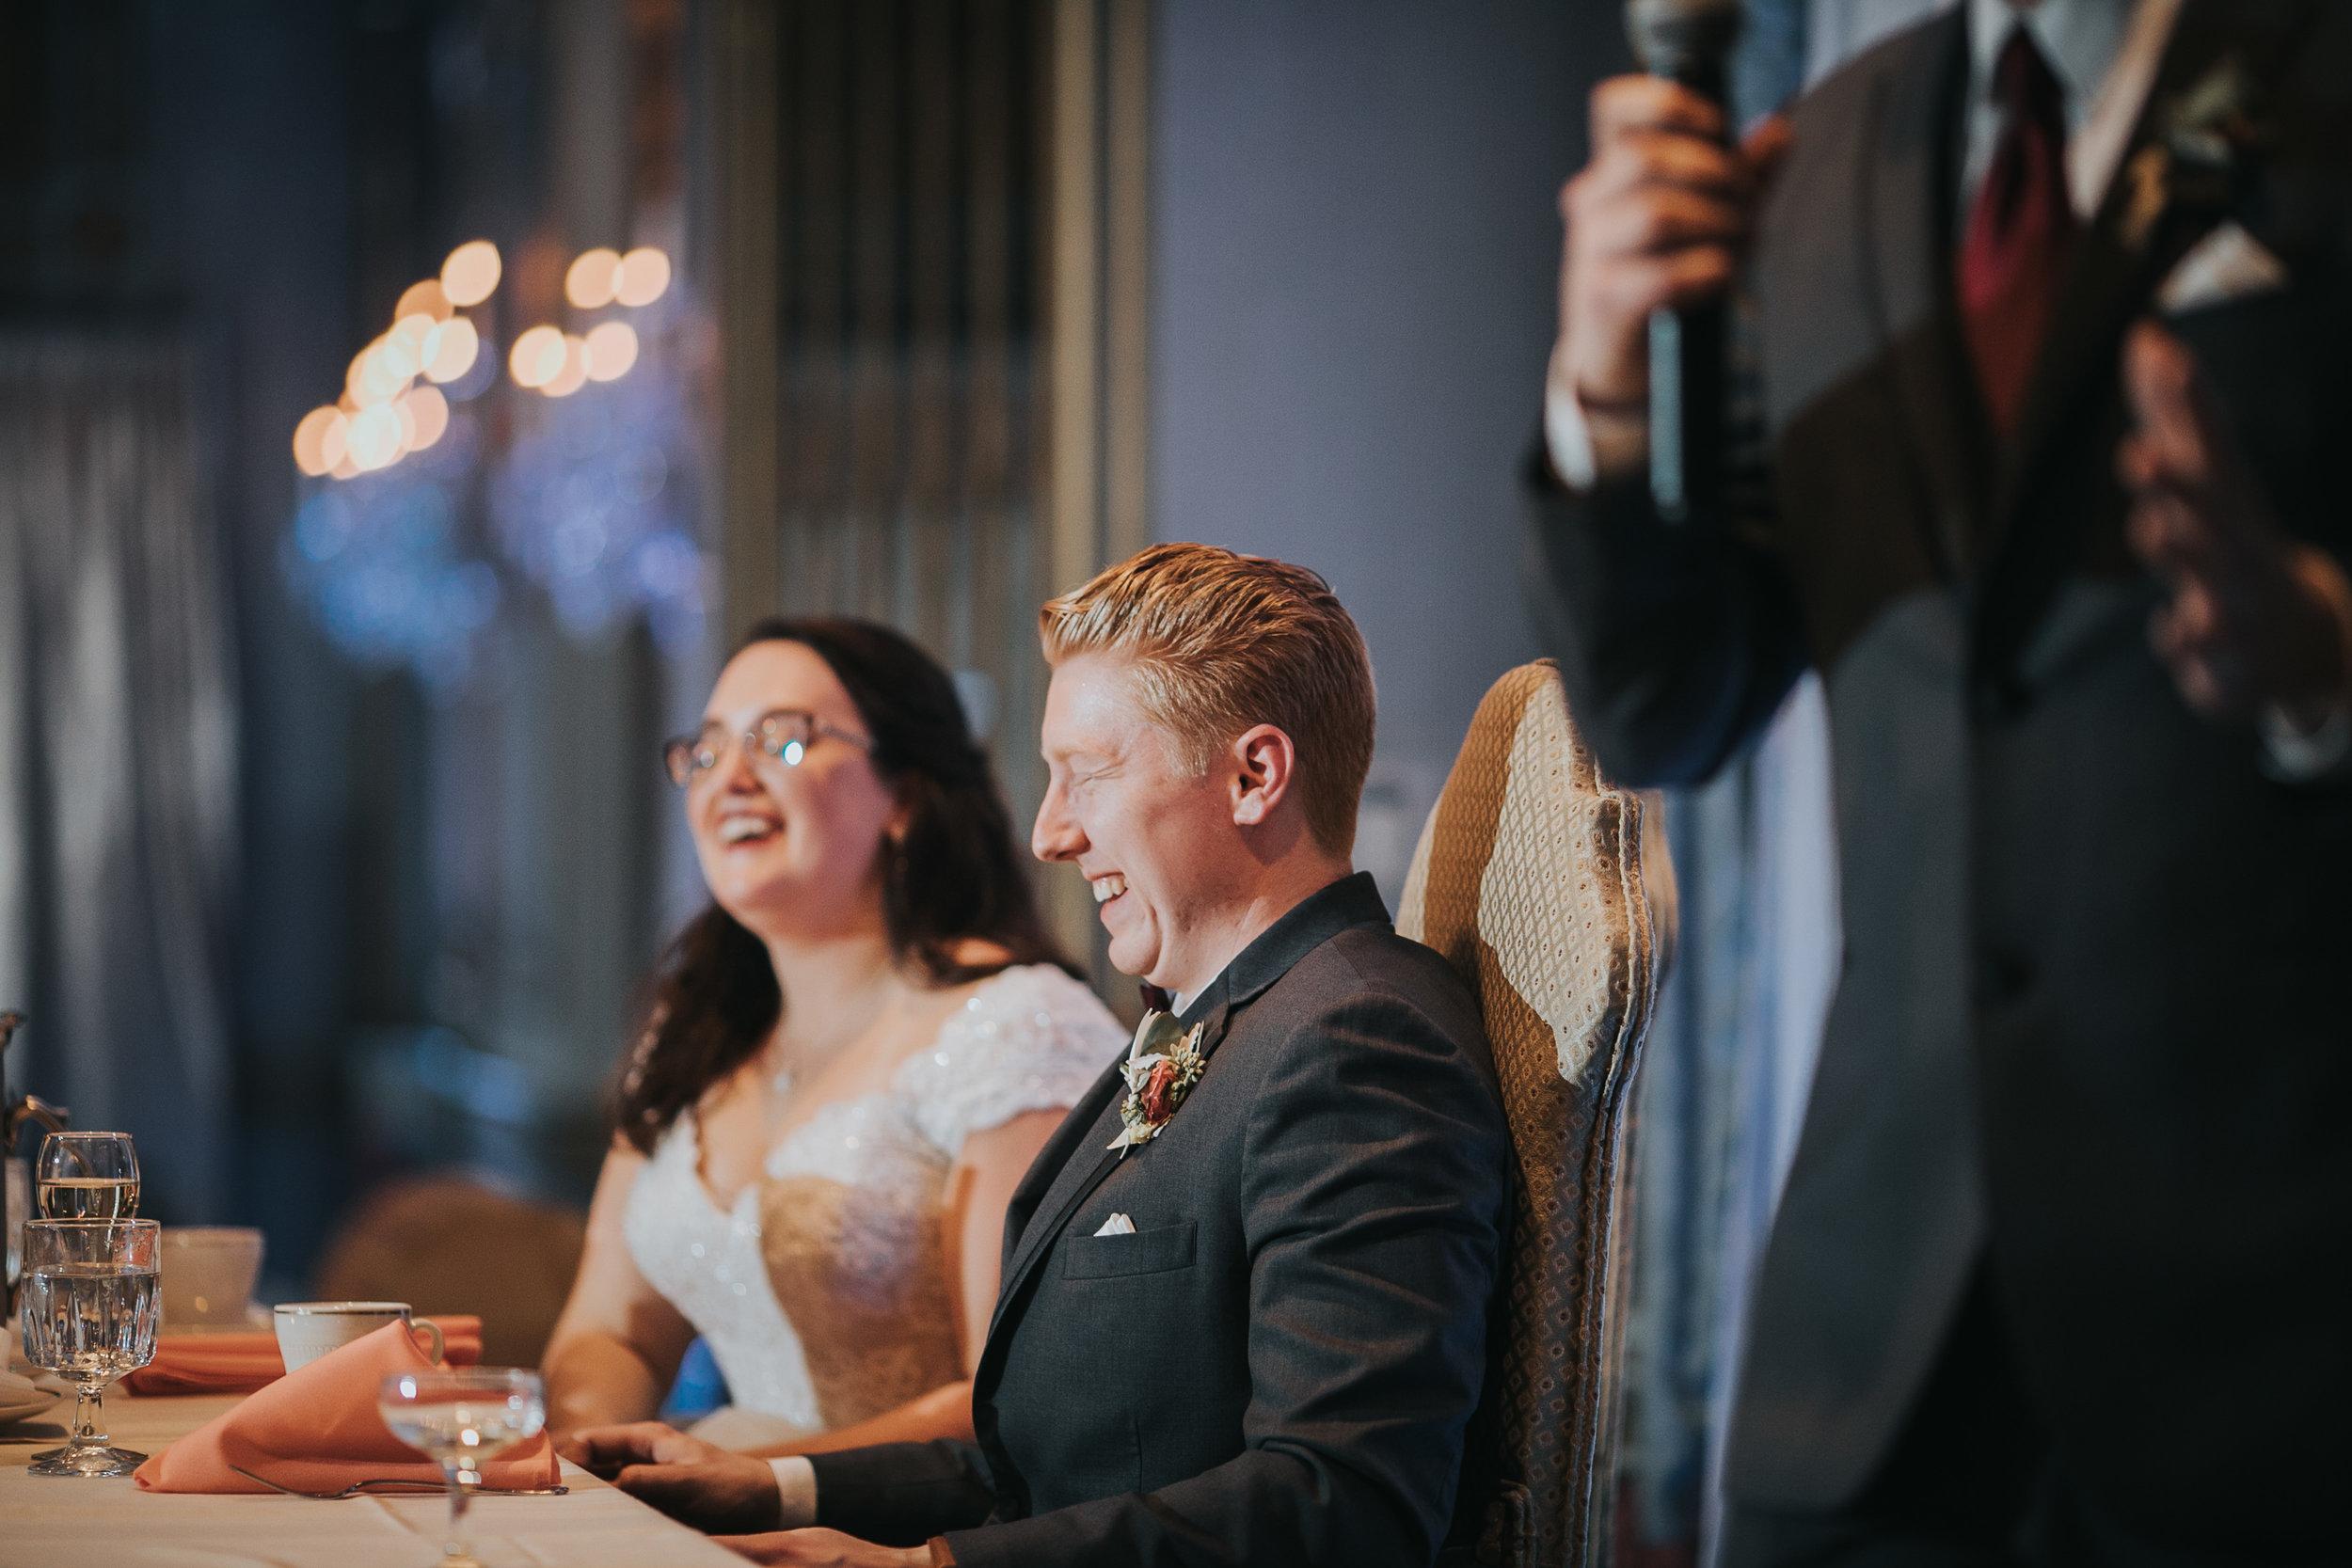 New-Jersey-Wedding-Photography-Fishers-Tudor-House-JennaLynnPhotography-Reception-Kathleen&Eddie-154.jpg